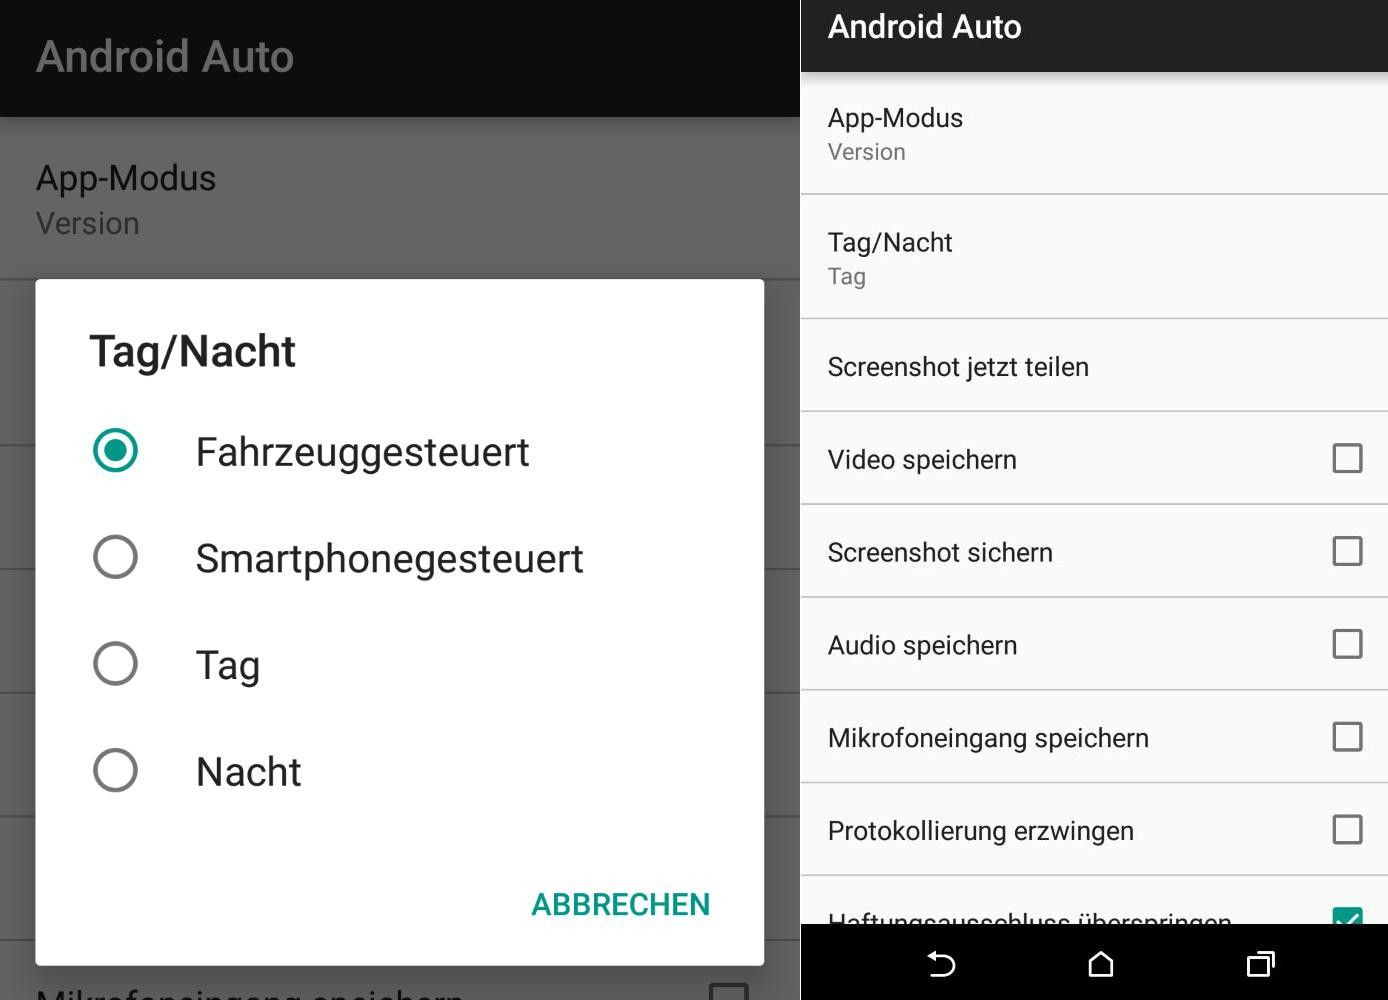 android auto im test funktionen apps auto hersteller pc welt. Black Bedroom Furniture Sets. Home Design Ideas